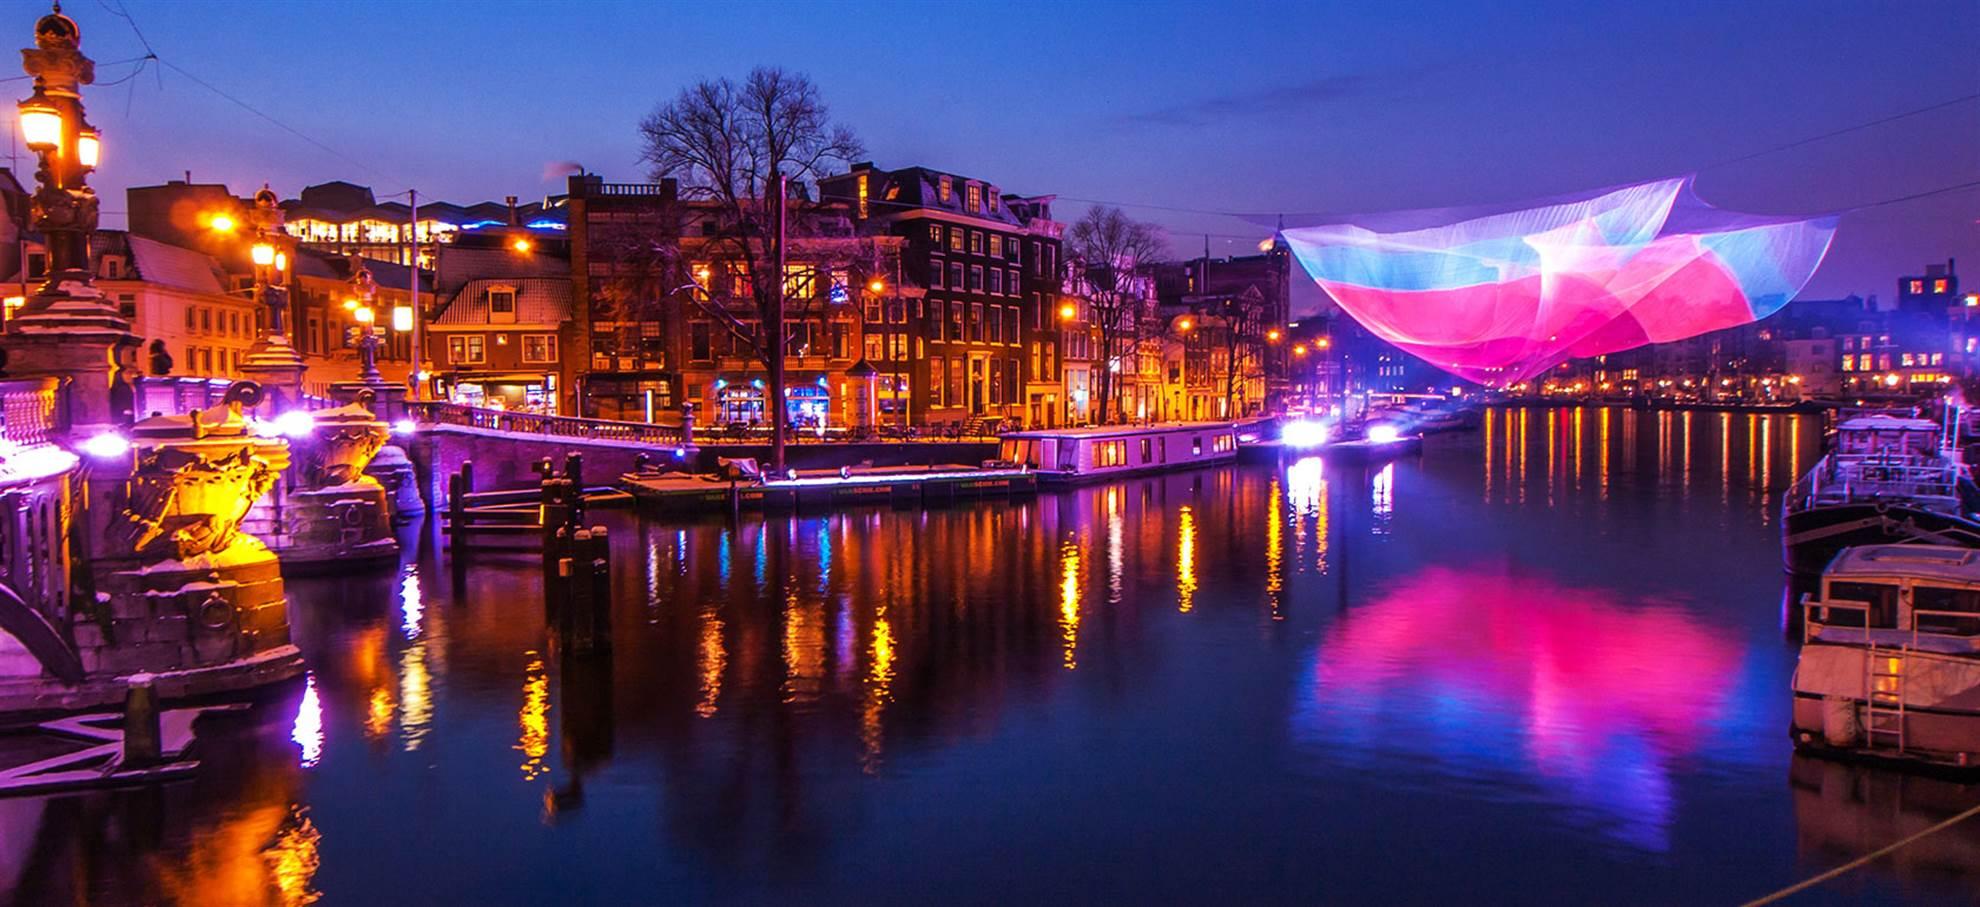 Crucero del Festival de la Luz de Amsterdam